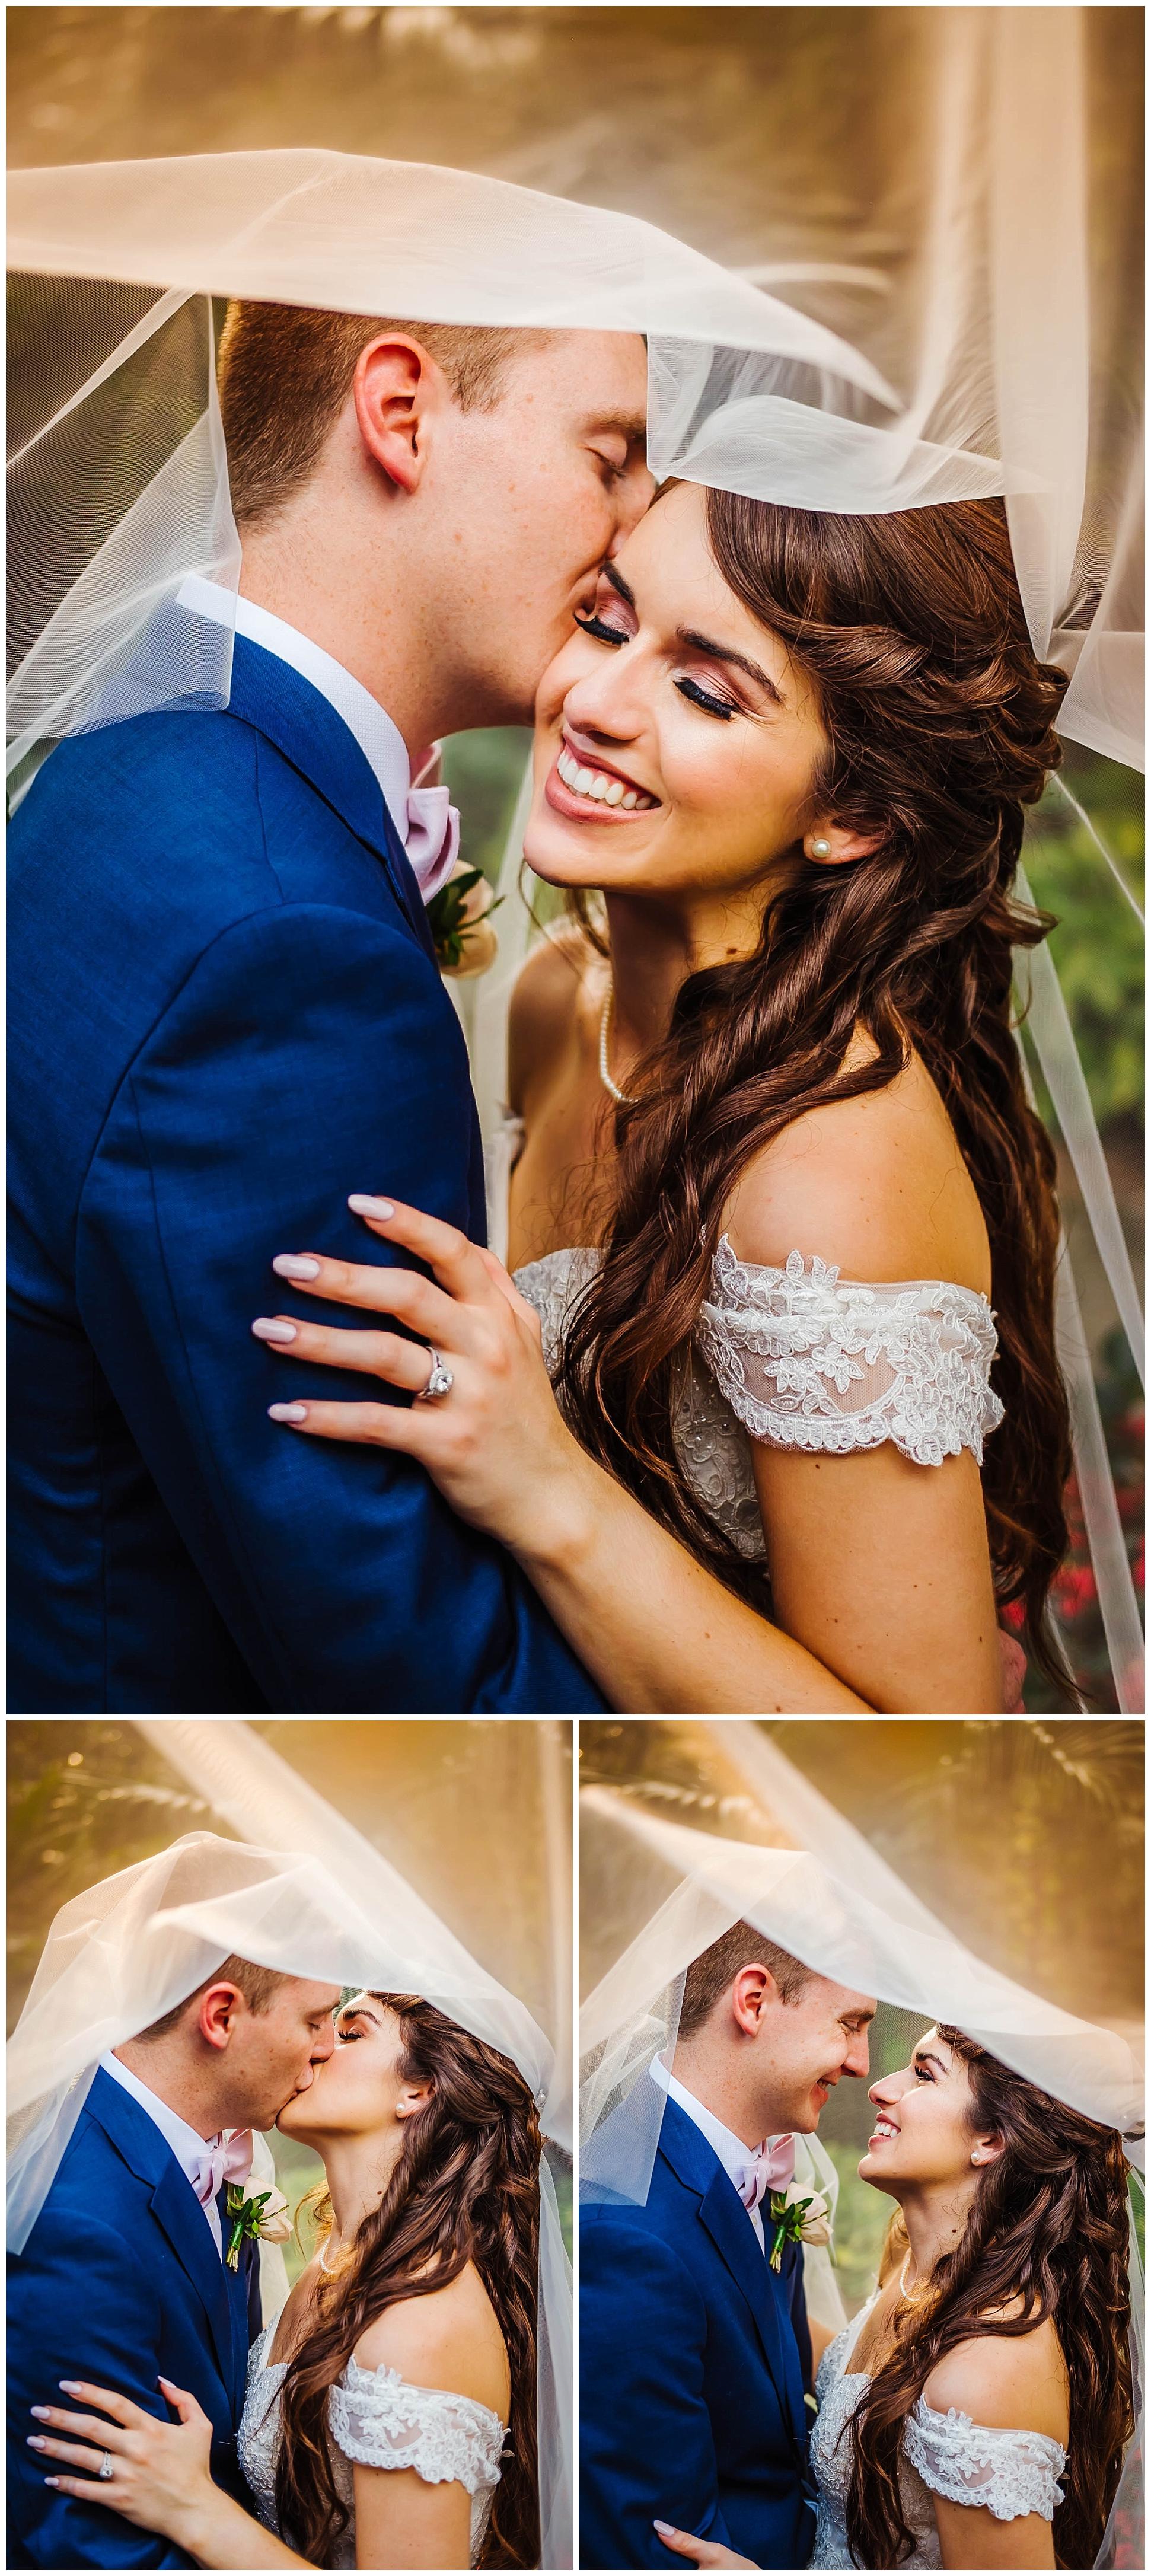 st-pete-wedding-photographer-sunken-gardens-crystal-ballroom-princess-dancer_0172.jpg